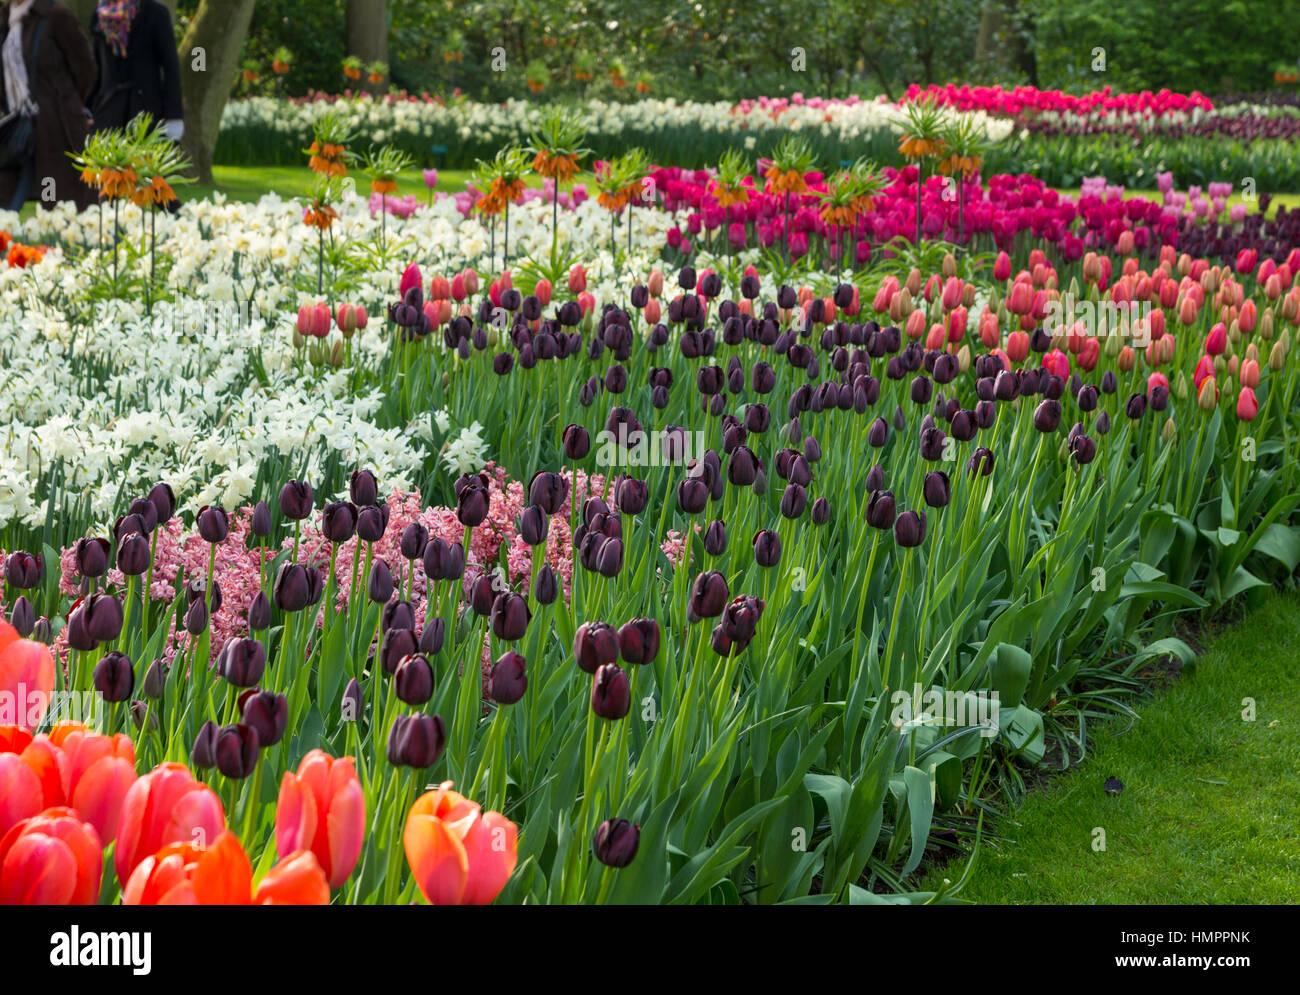 Blooming flowers in Keukenhof park in the Netherlands - Stock Image